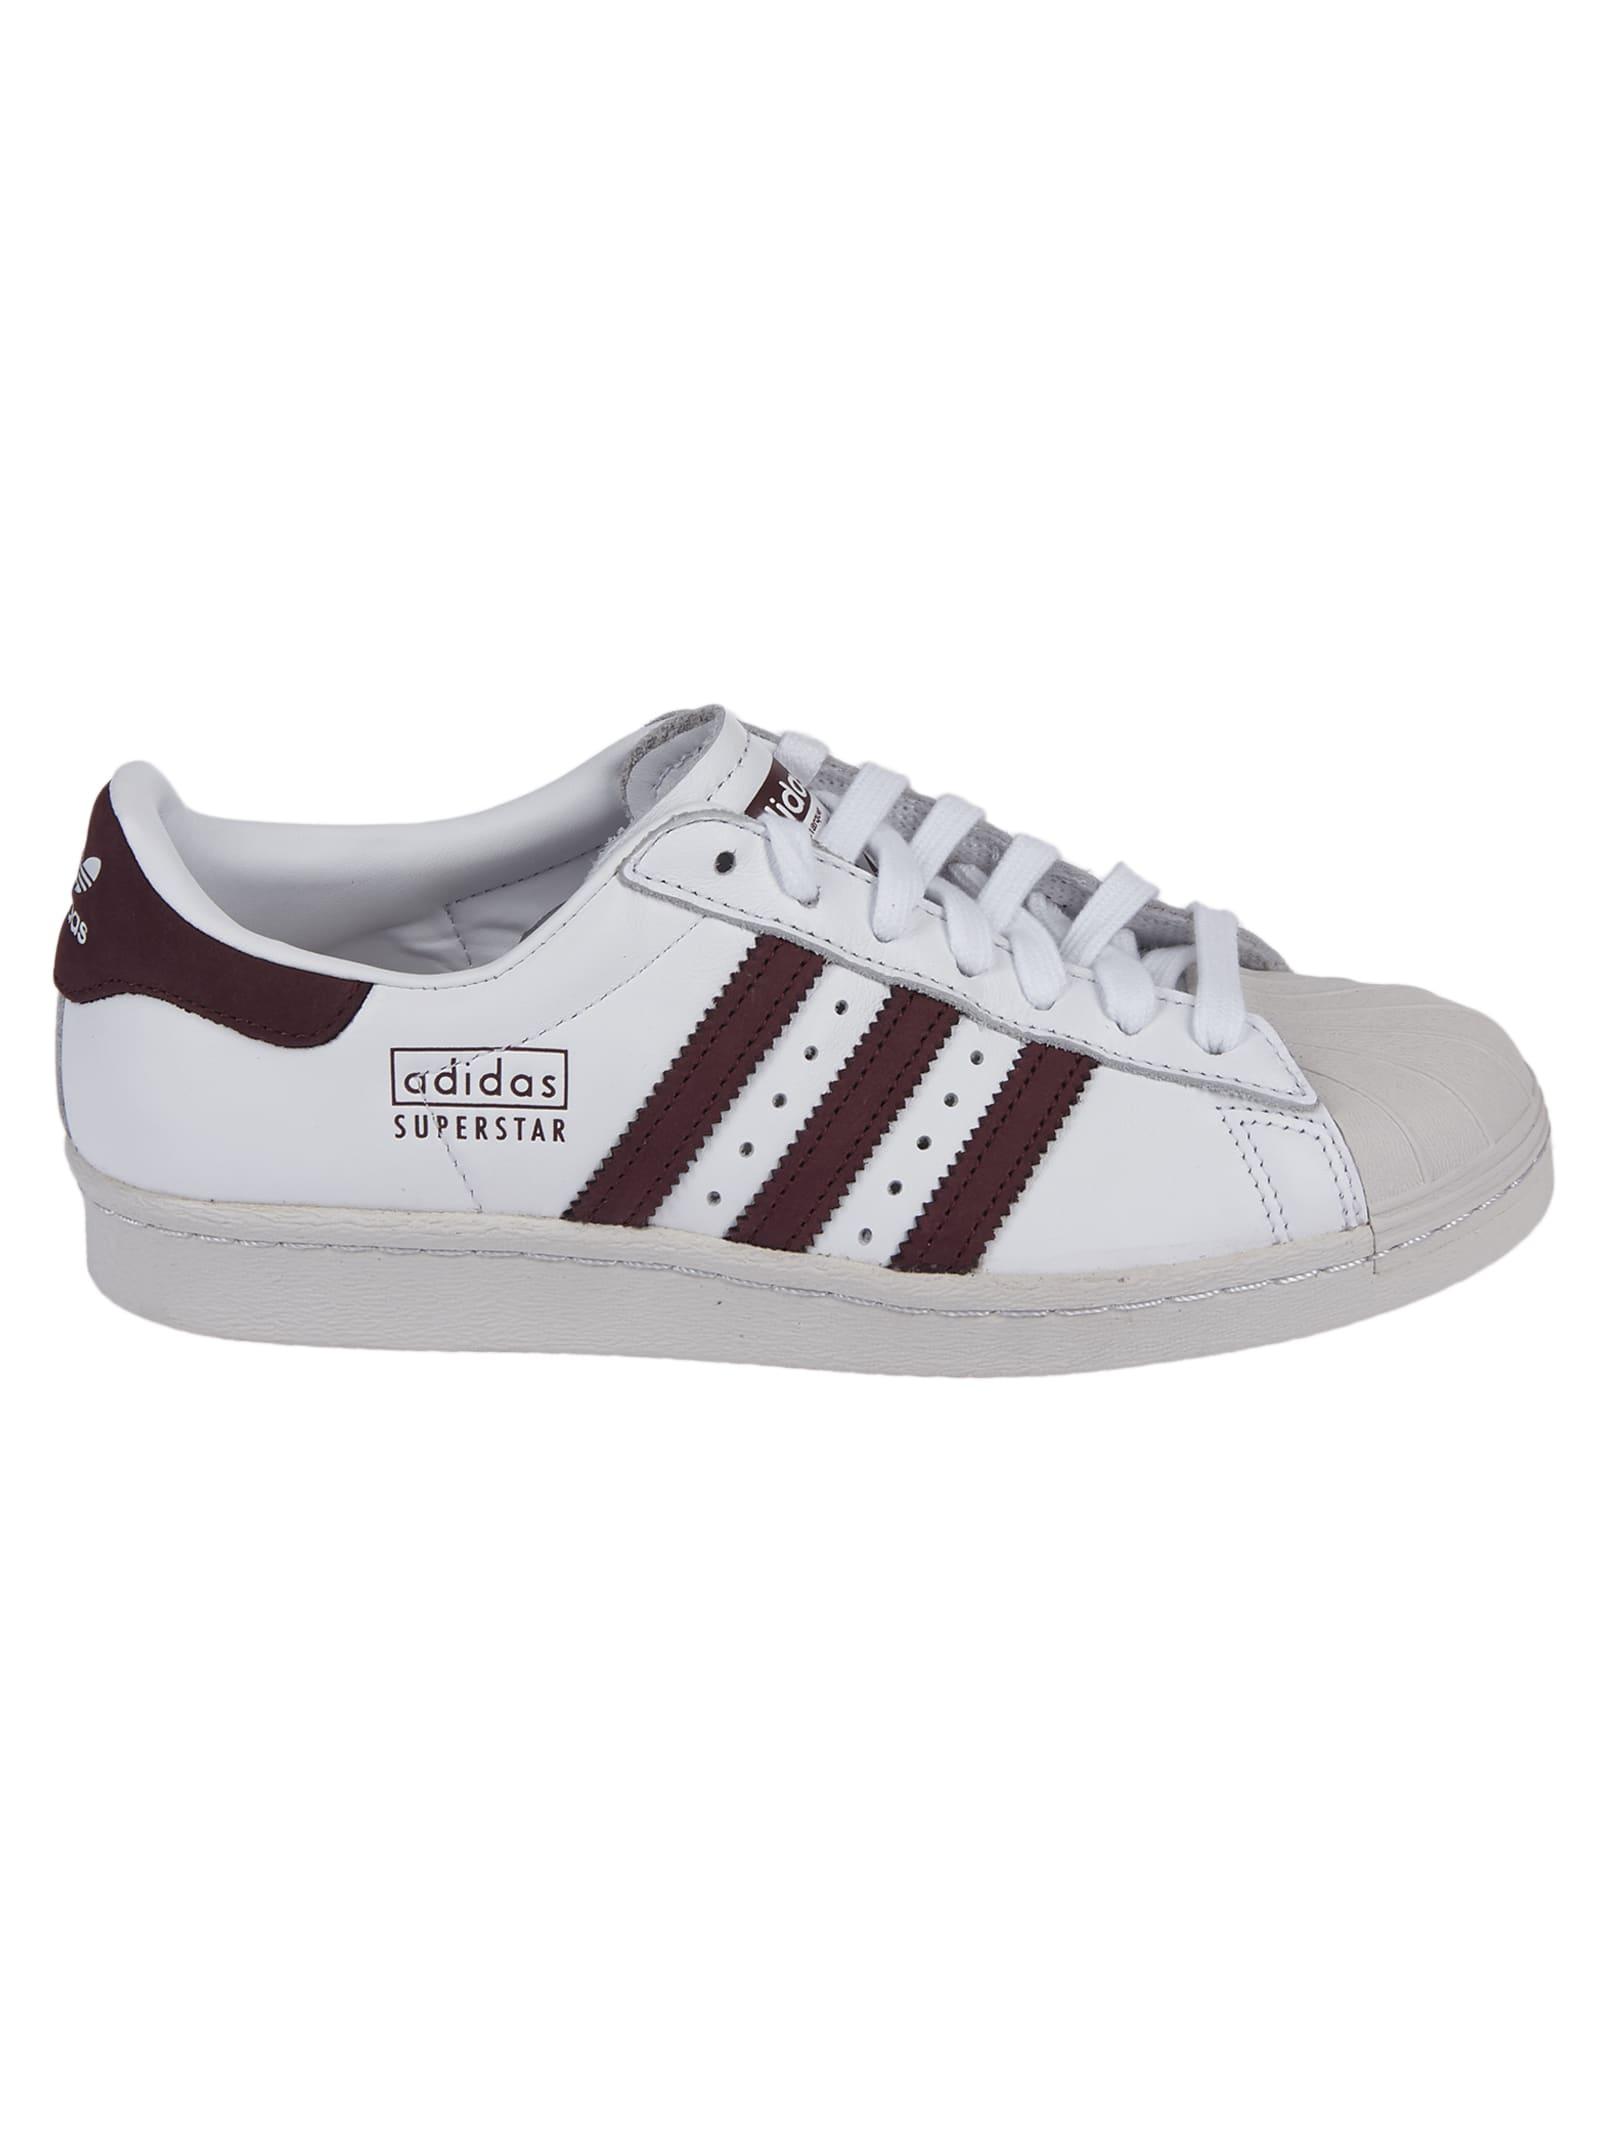 Cut Adidas Low Sneakers White Originals 29YWEDHI